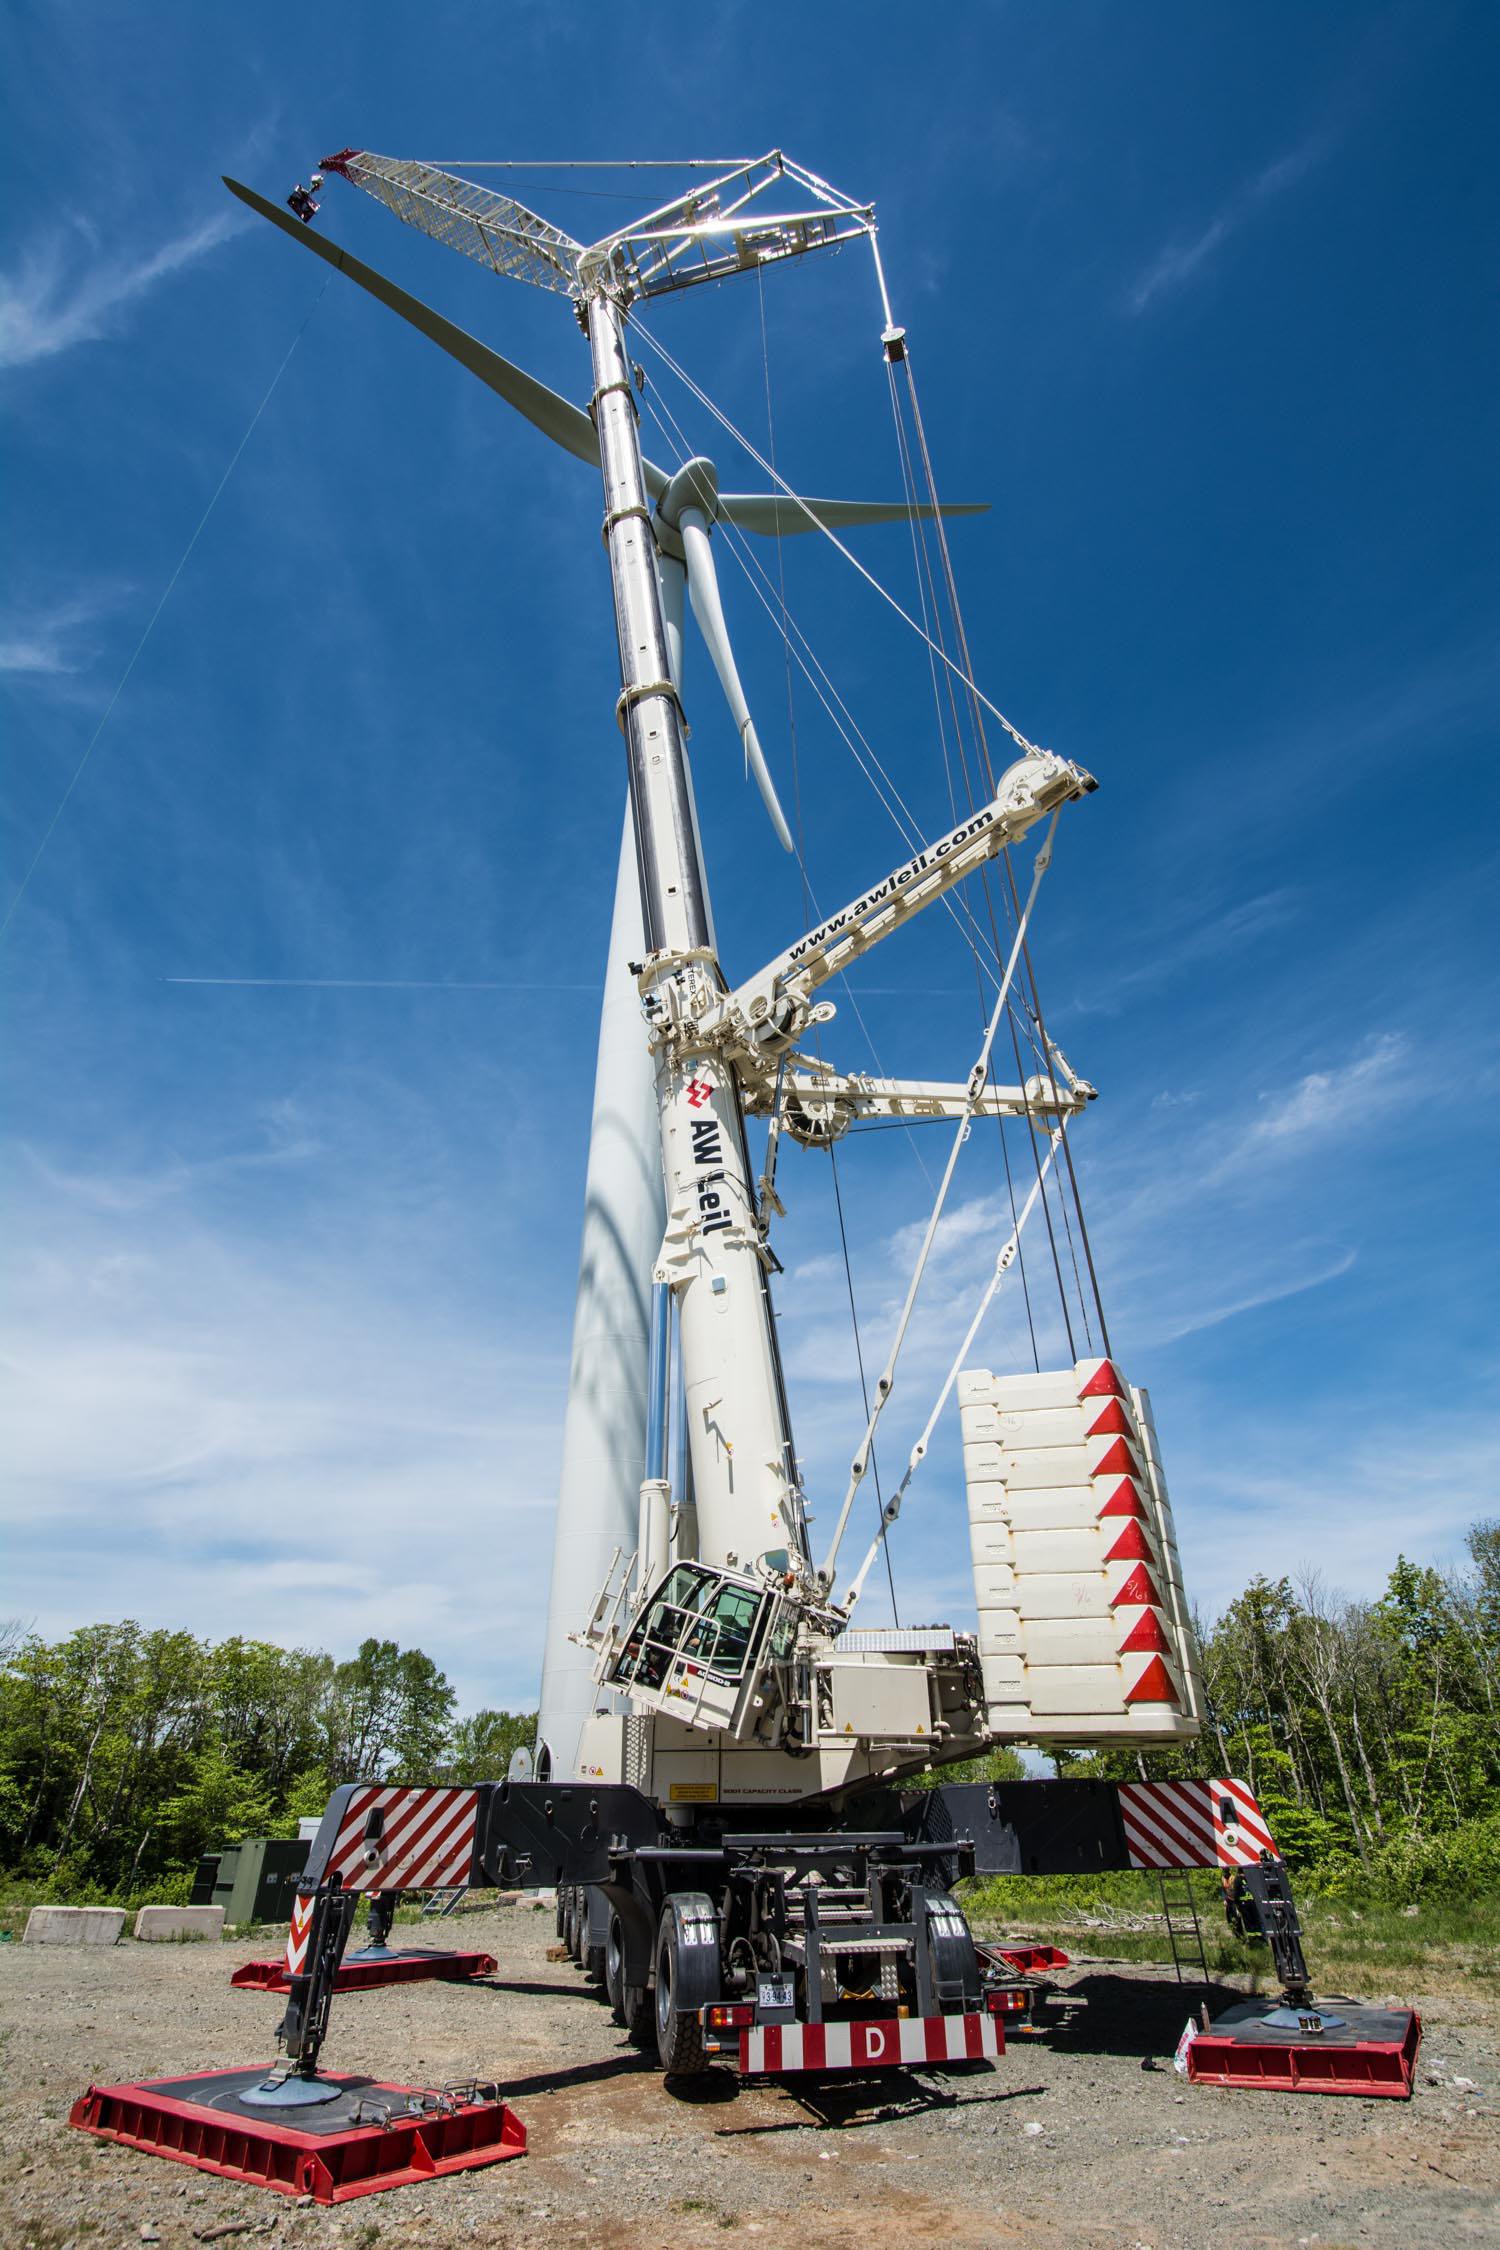 june09 2014-A. W. Leil Cranes and Equipment Limited-promo-Antigonish NS-photo by Aaron McKenzie Fraser-www.amfraser.com-7118.jpg